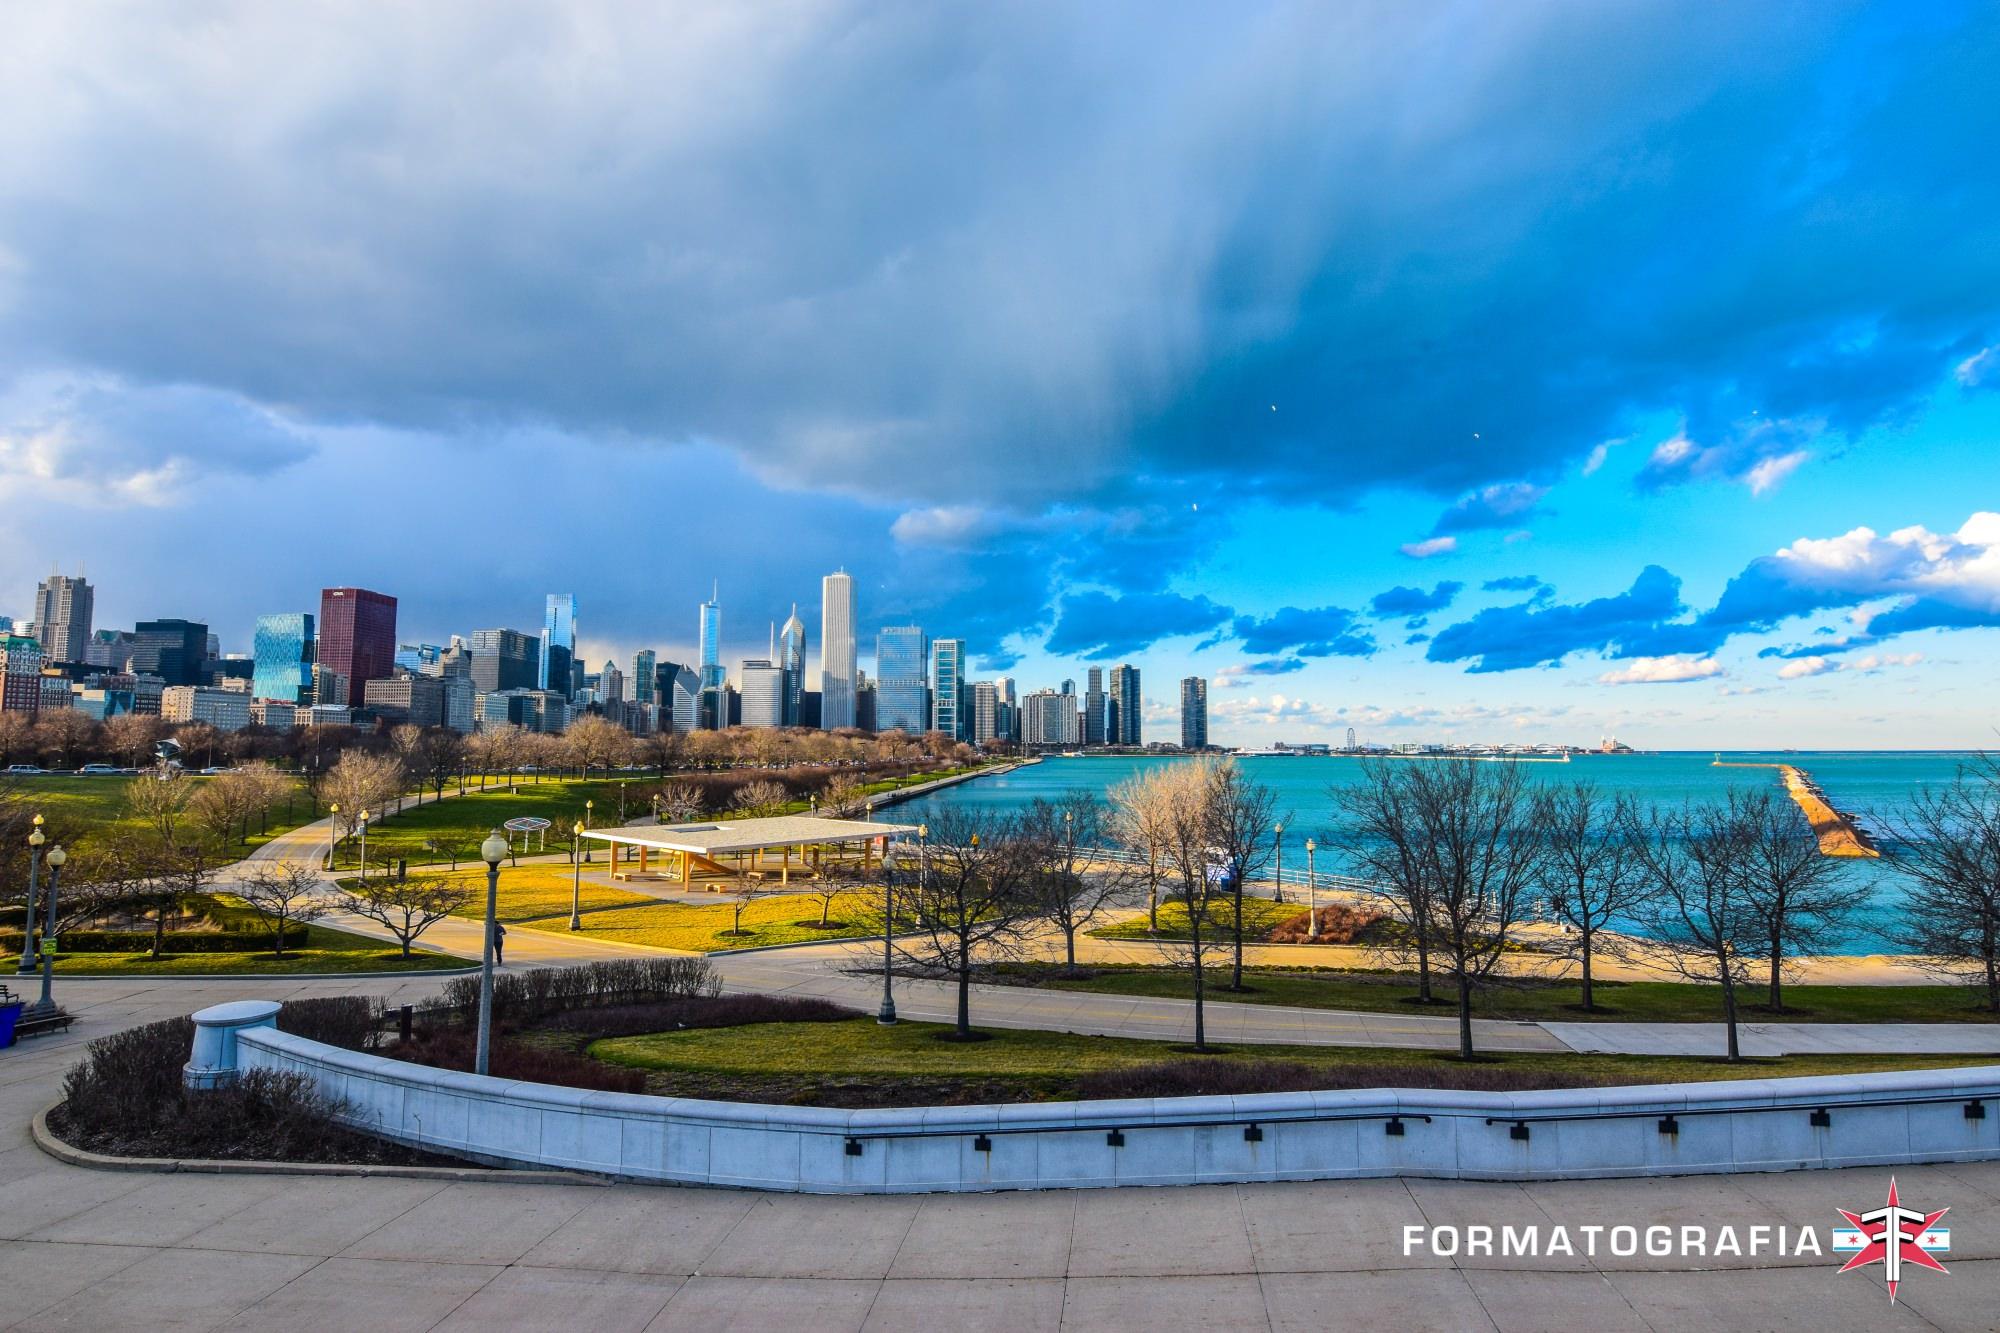 eric formato chicago photographer fall update city architecture shots20160316-DSC_0582.jpg